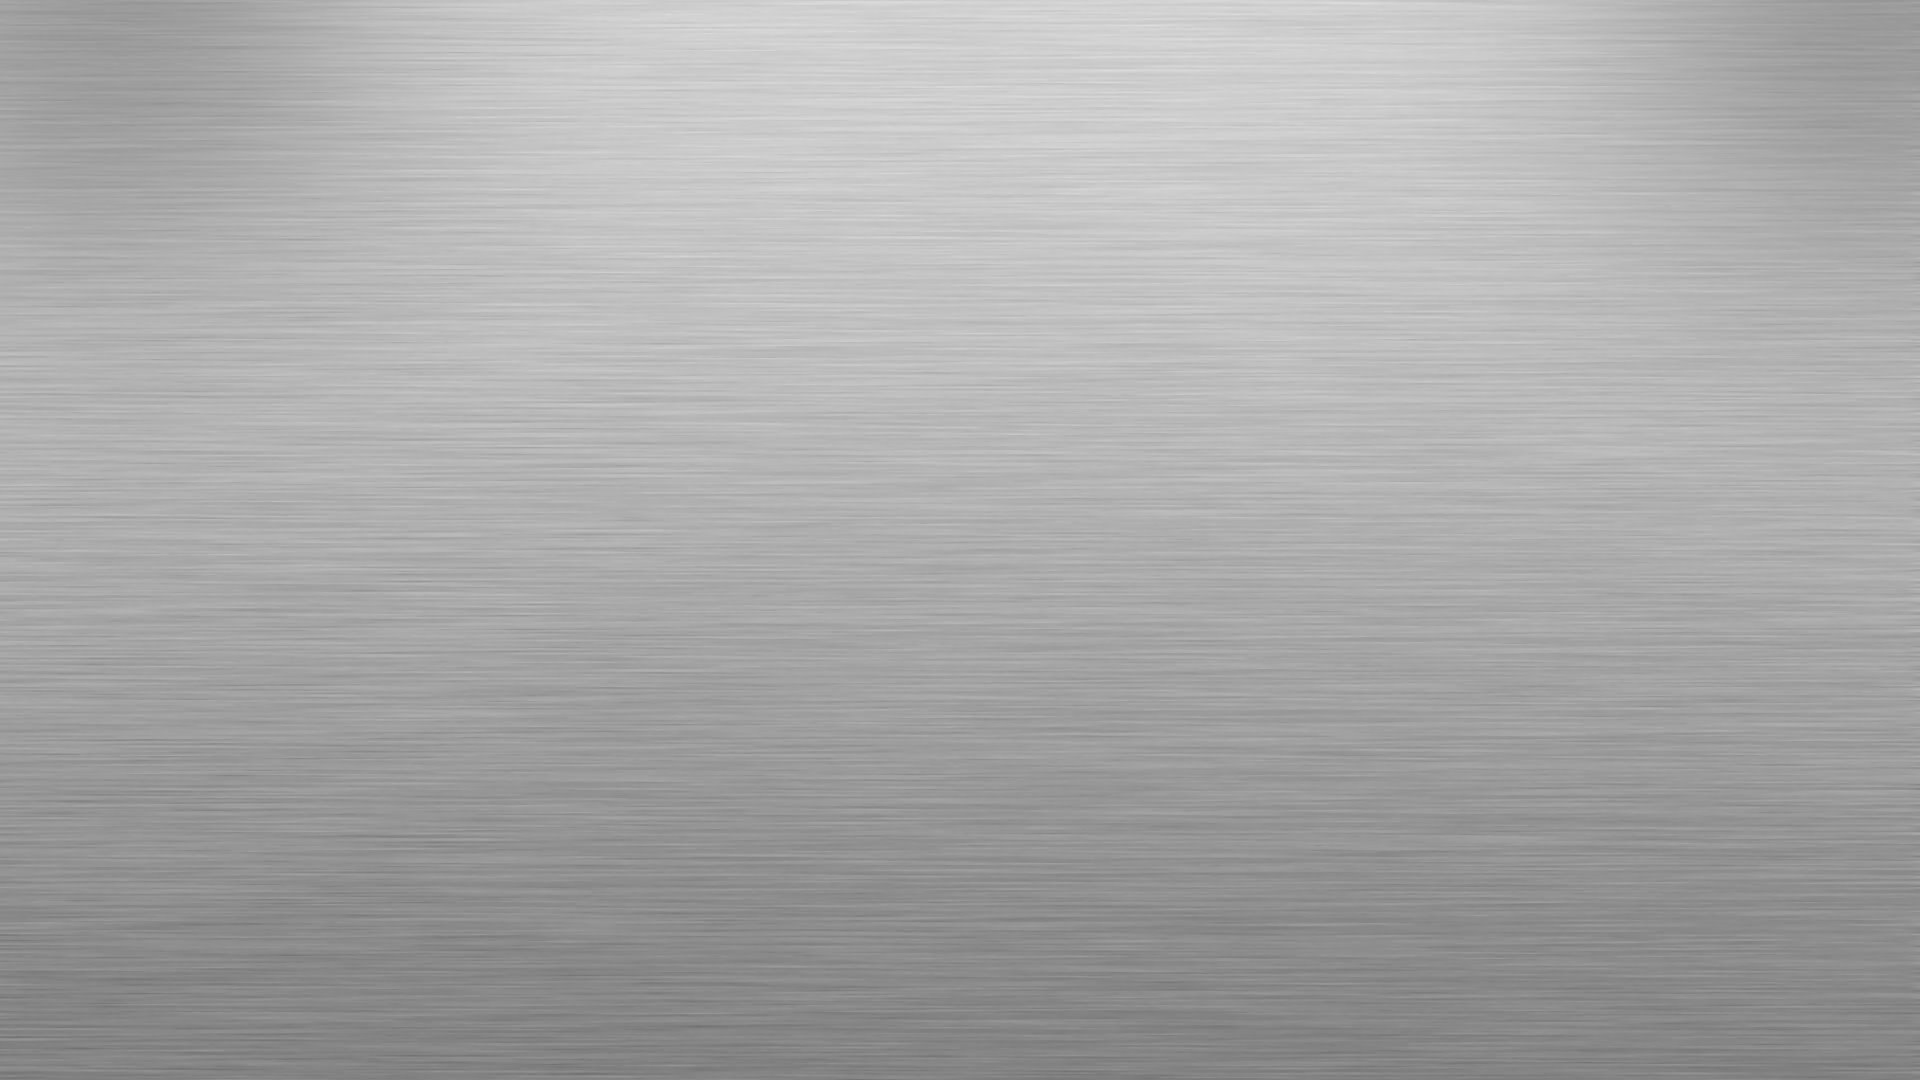 brushed-metal-texture-1080p | Facultatieve Technologies